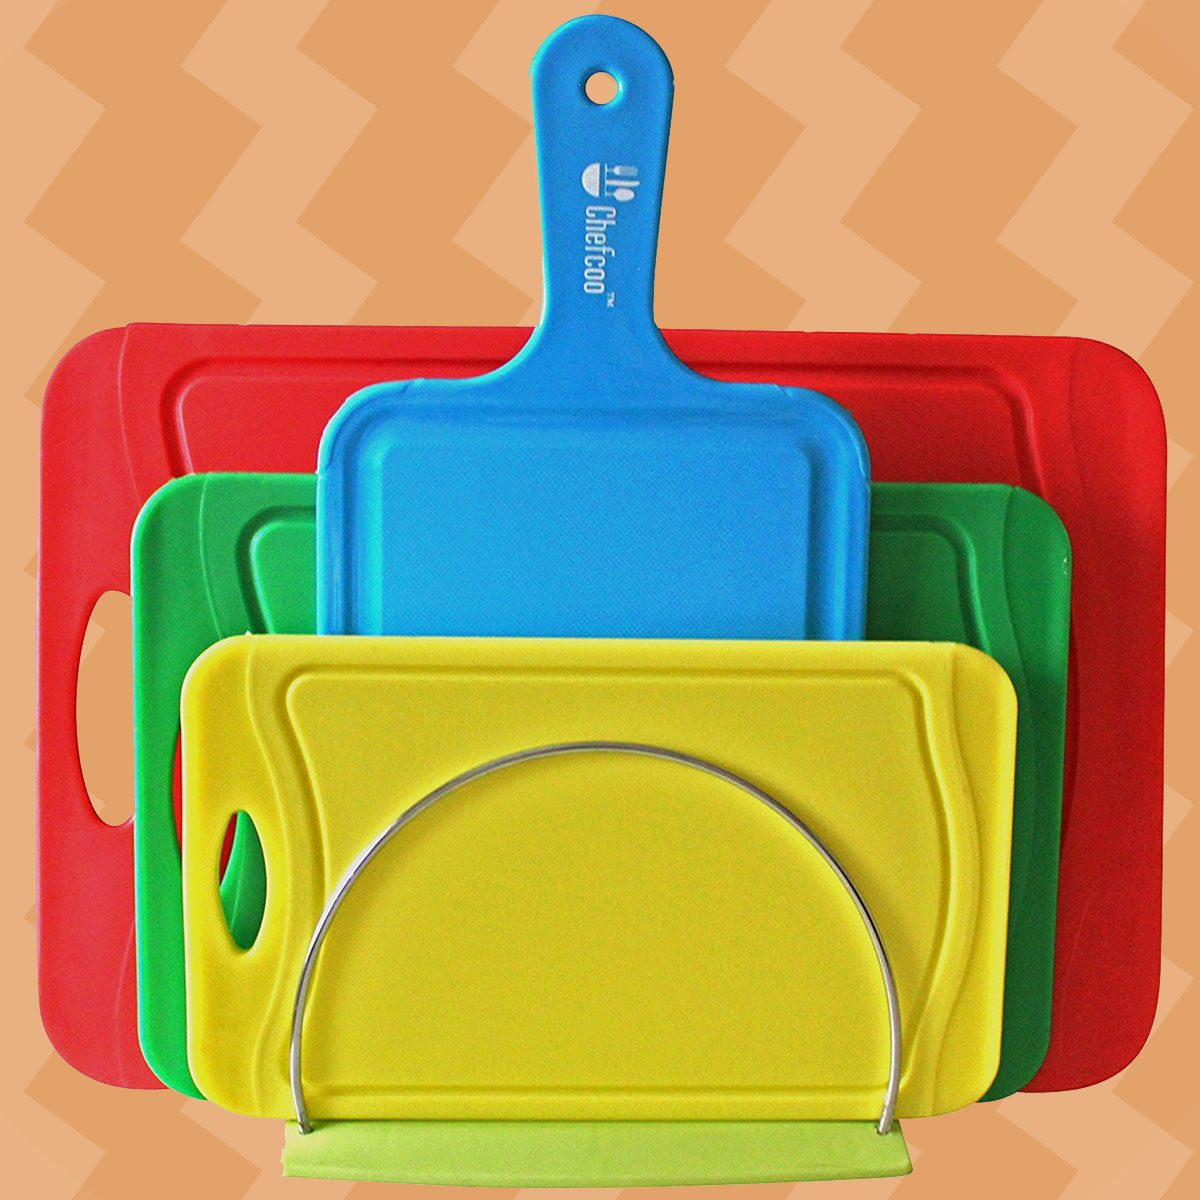 Chefcoo Cutting Board Set Stylish Color Plastic Non-Slip Kitchen Chopping Block